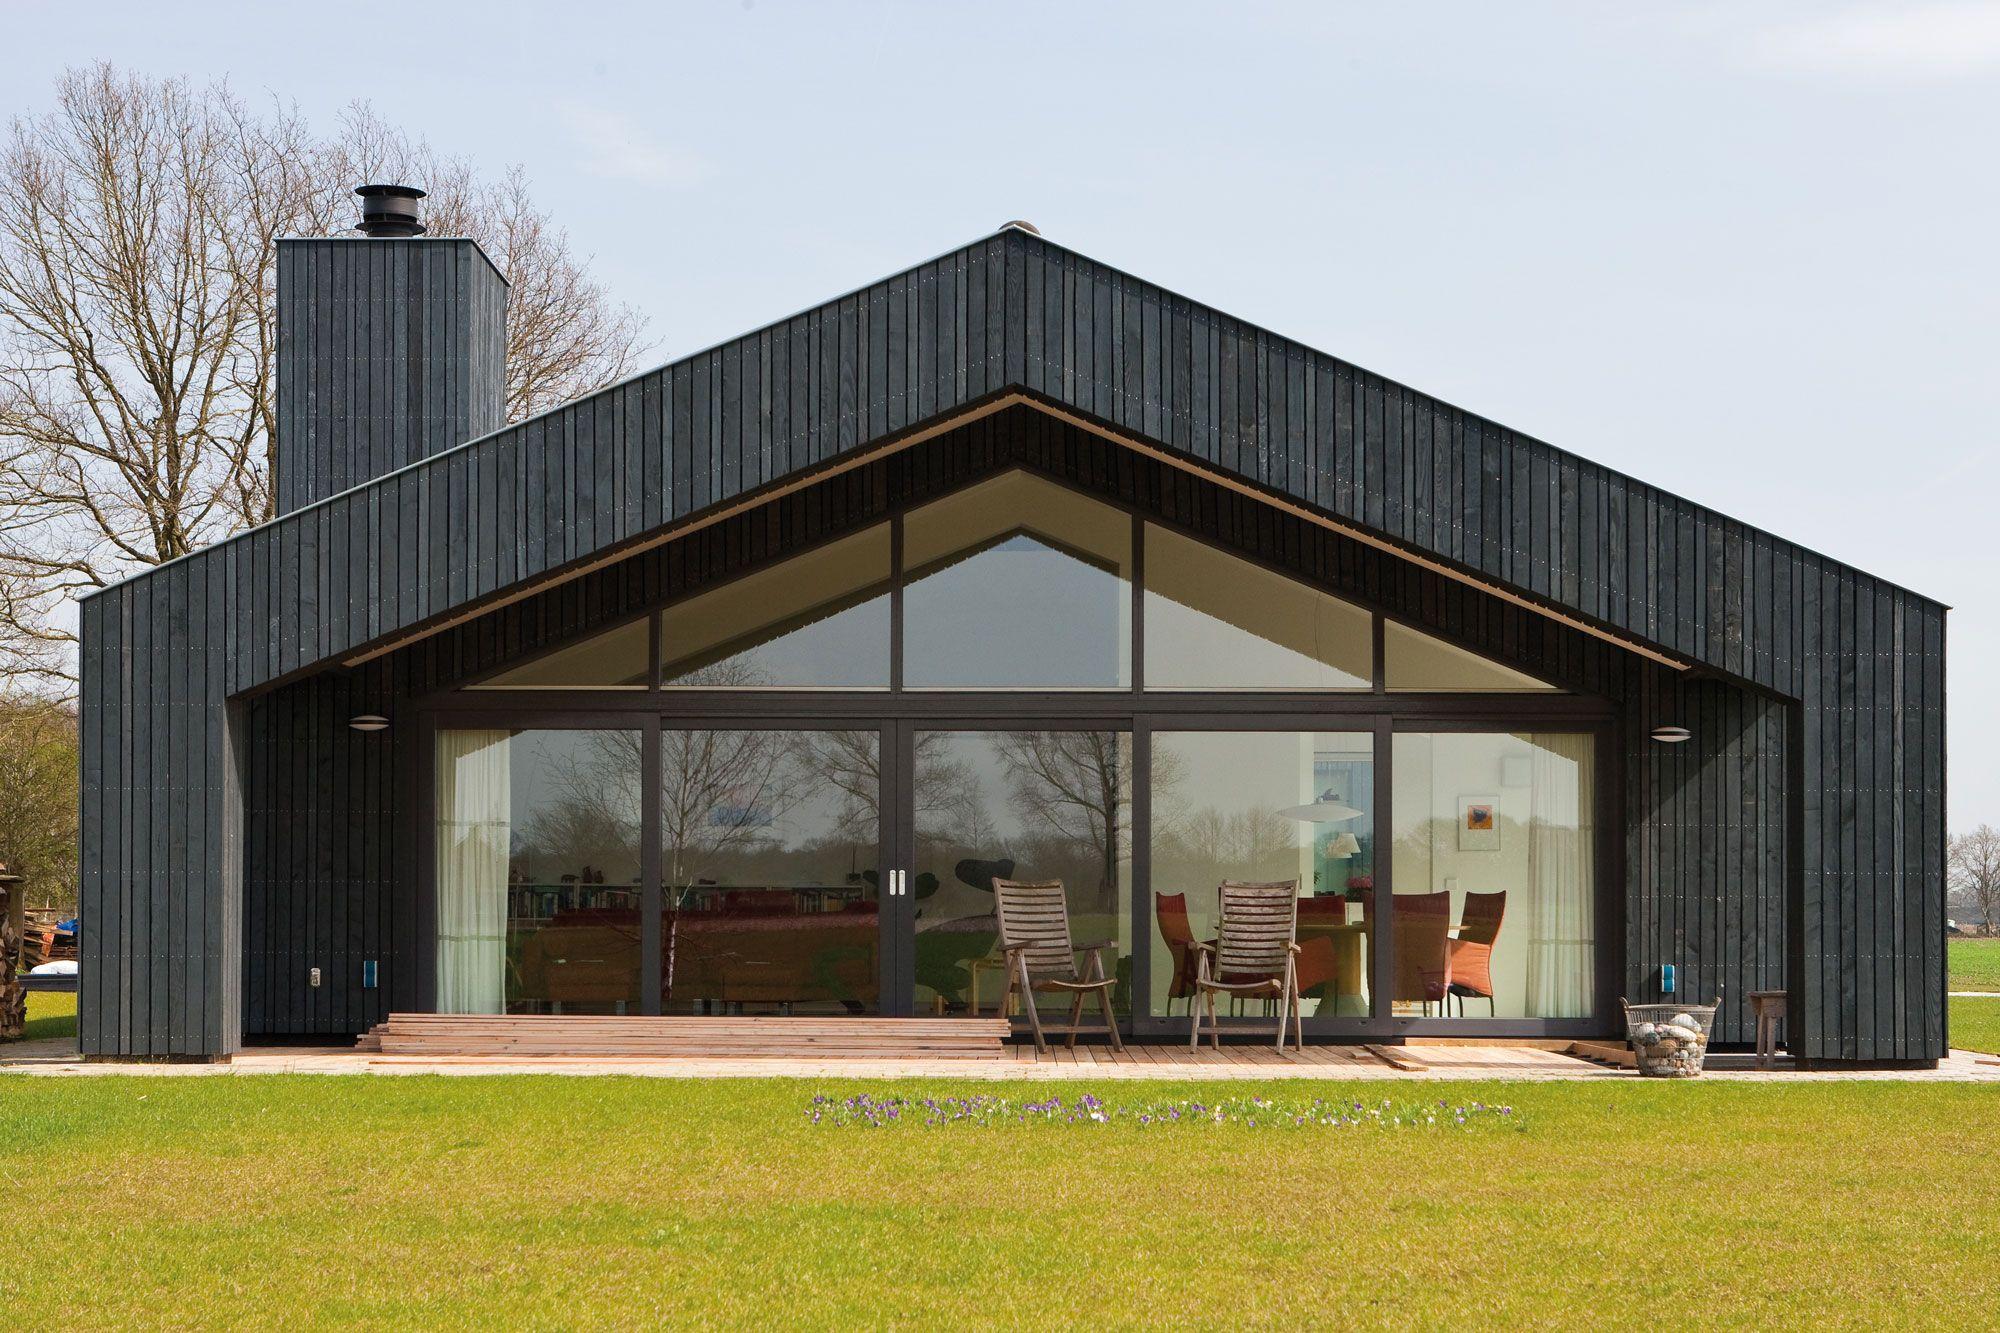 Schuurwoning bouwen kavel en huisje pinterest for Kostprijs woning bouwen